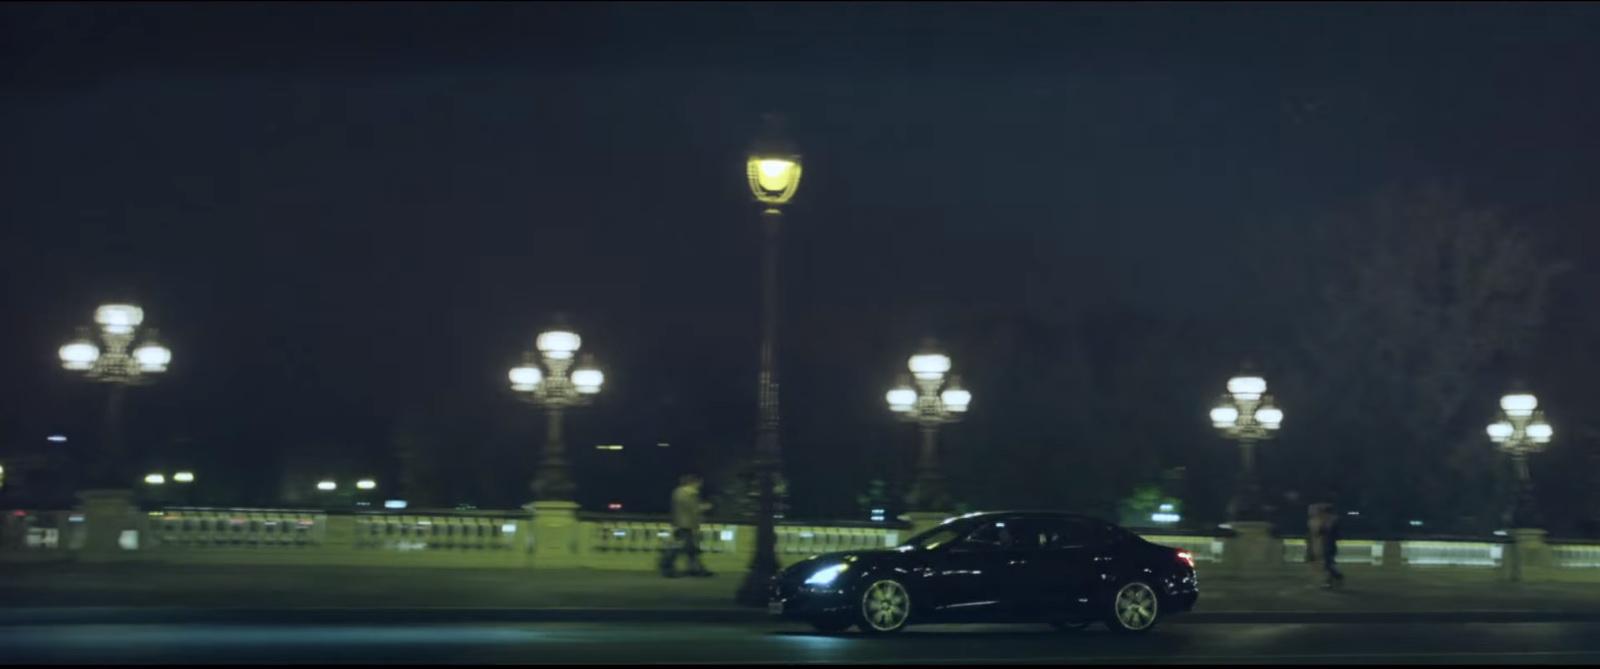 Maserati Quattroporte - Mylène Farmer & Sting - Stolen Car (5)